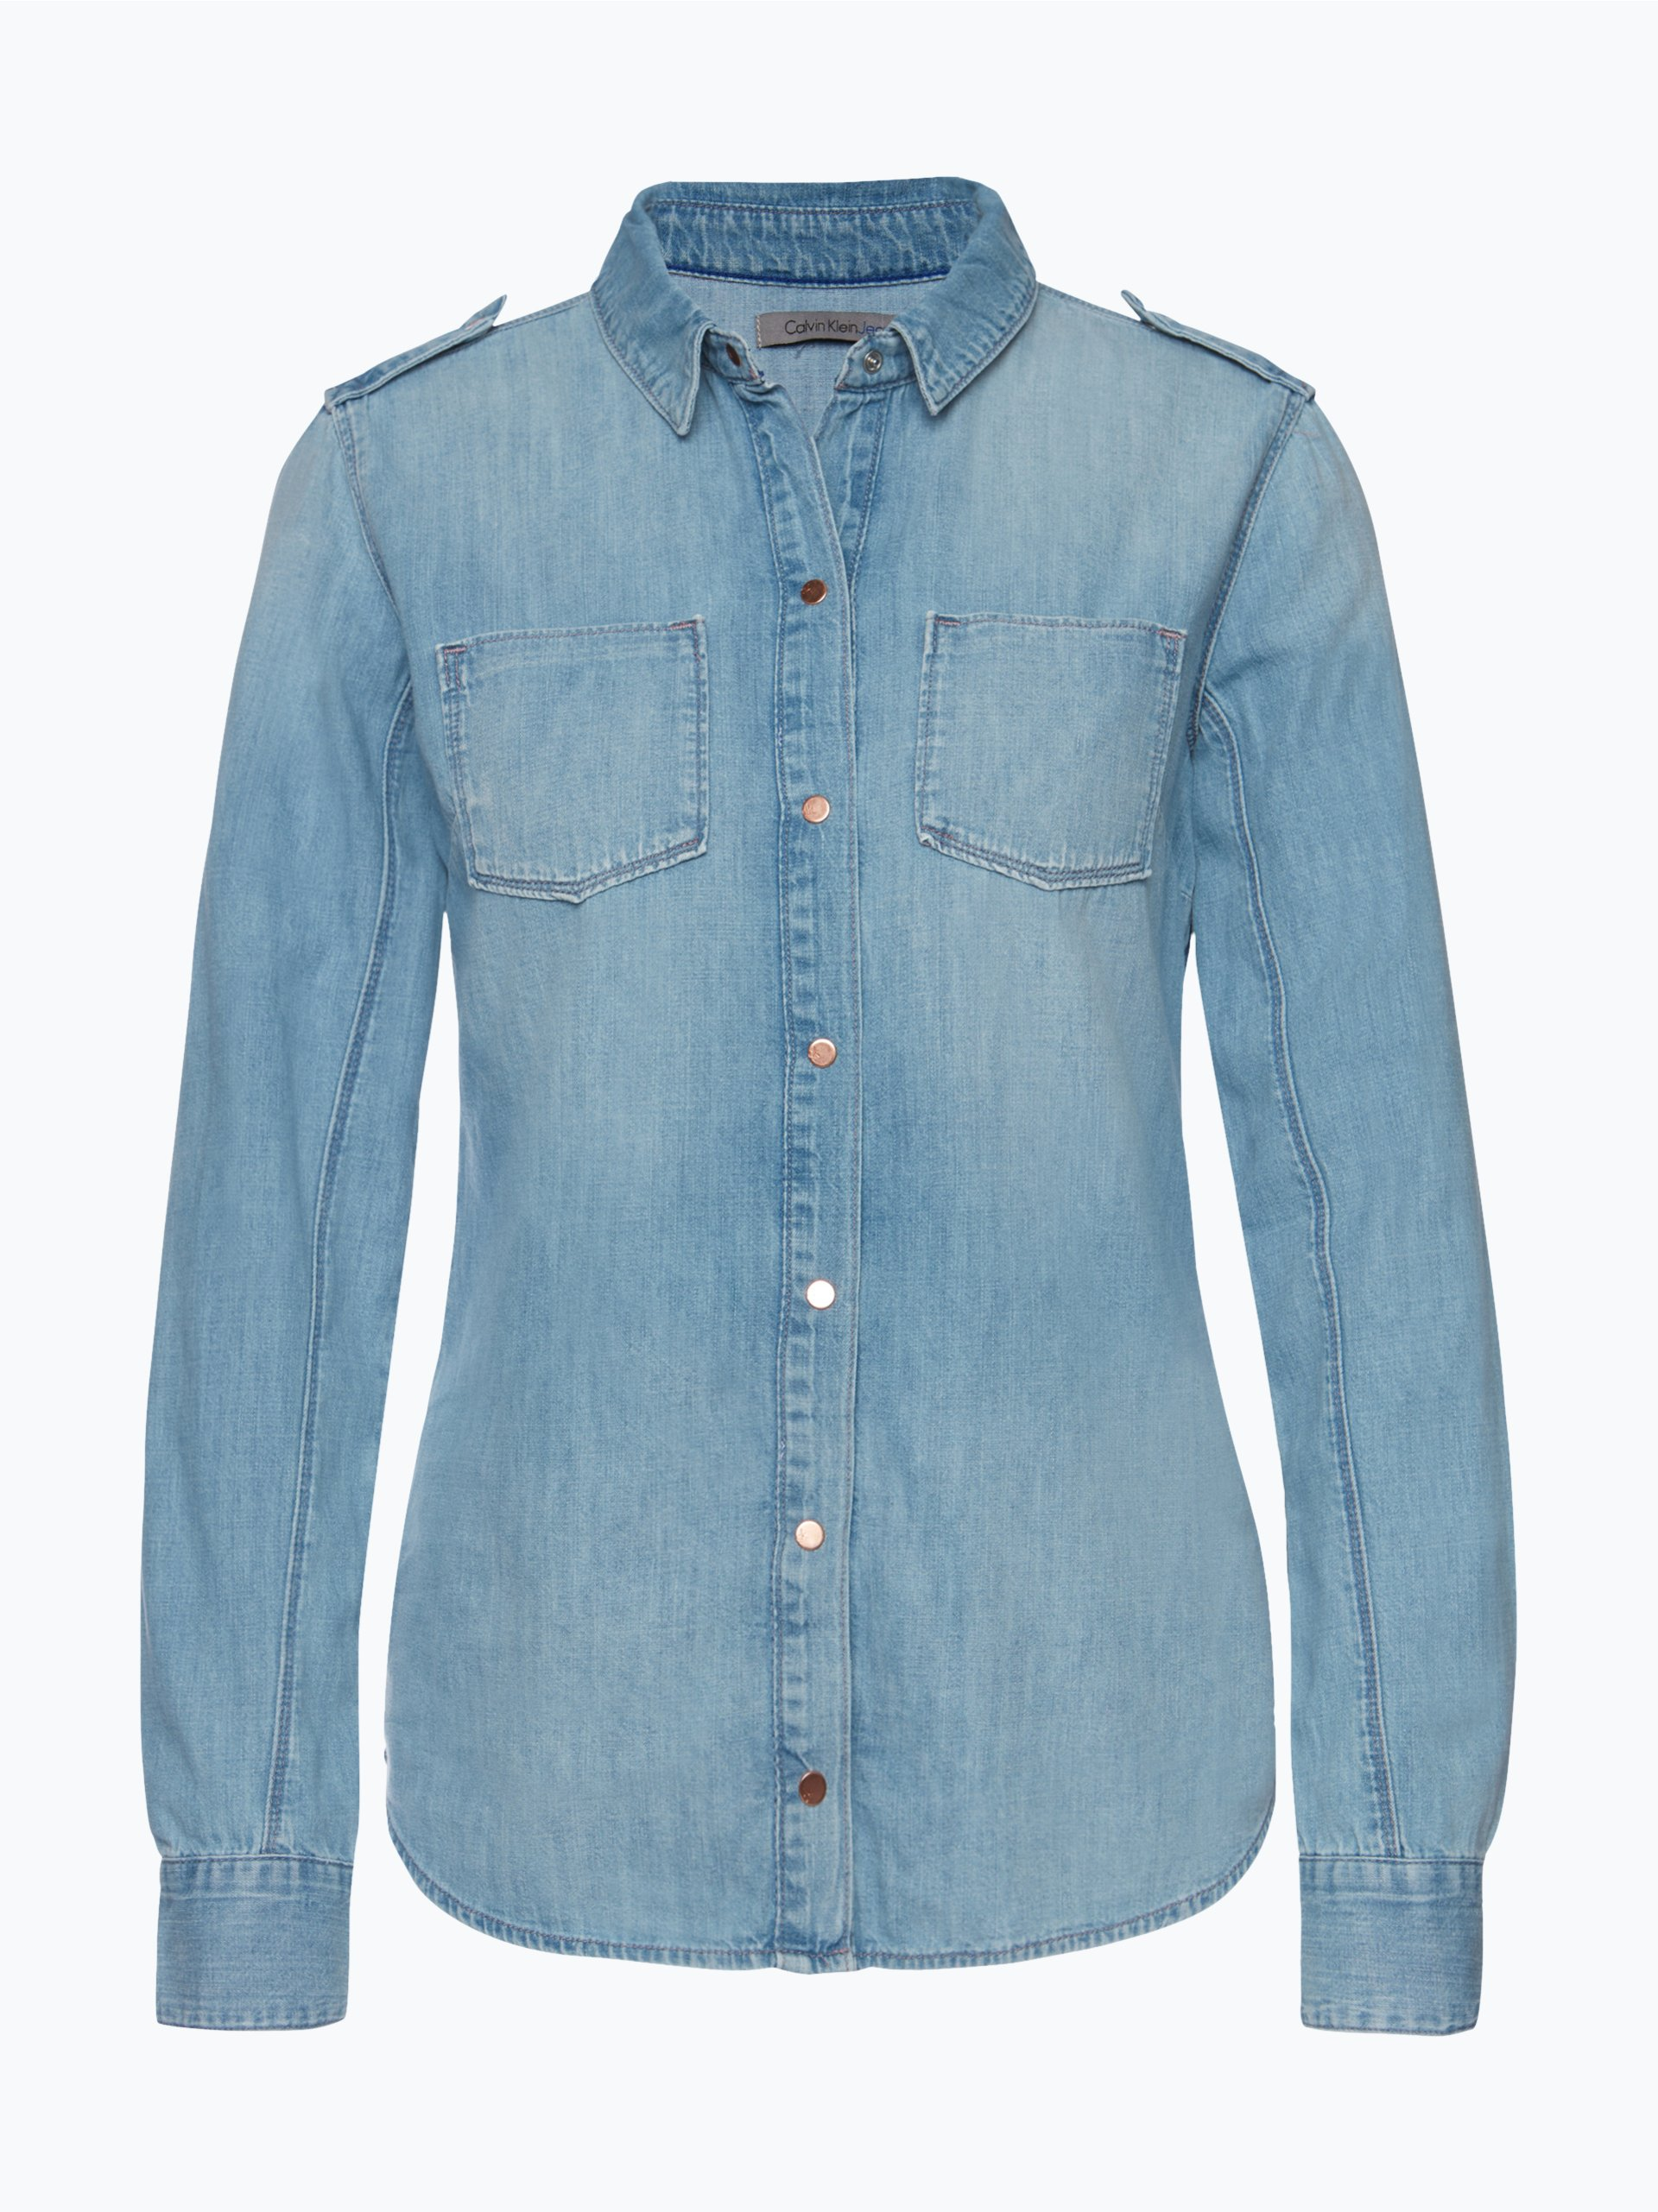 calvin klein jeans damen bluse grau uni online kaufen. Black Bedroom Furniture Sets. Home Design Ideas